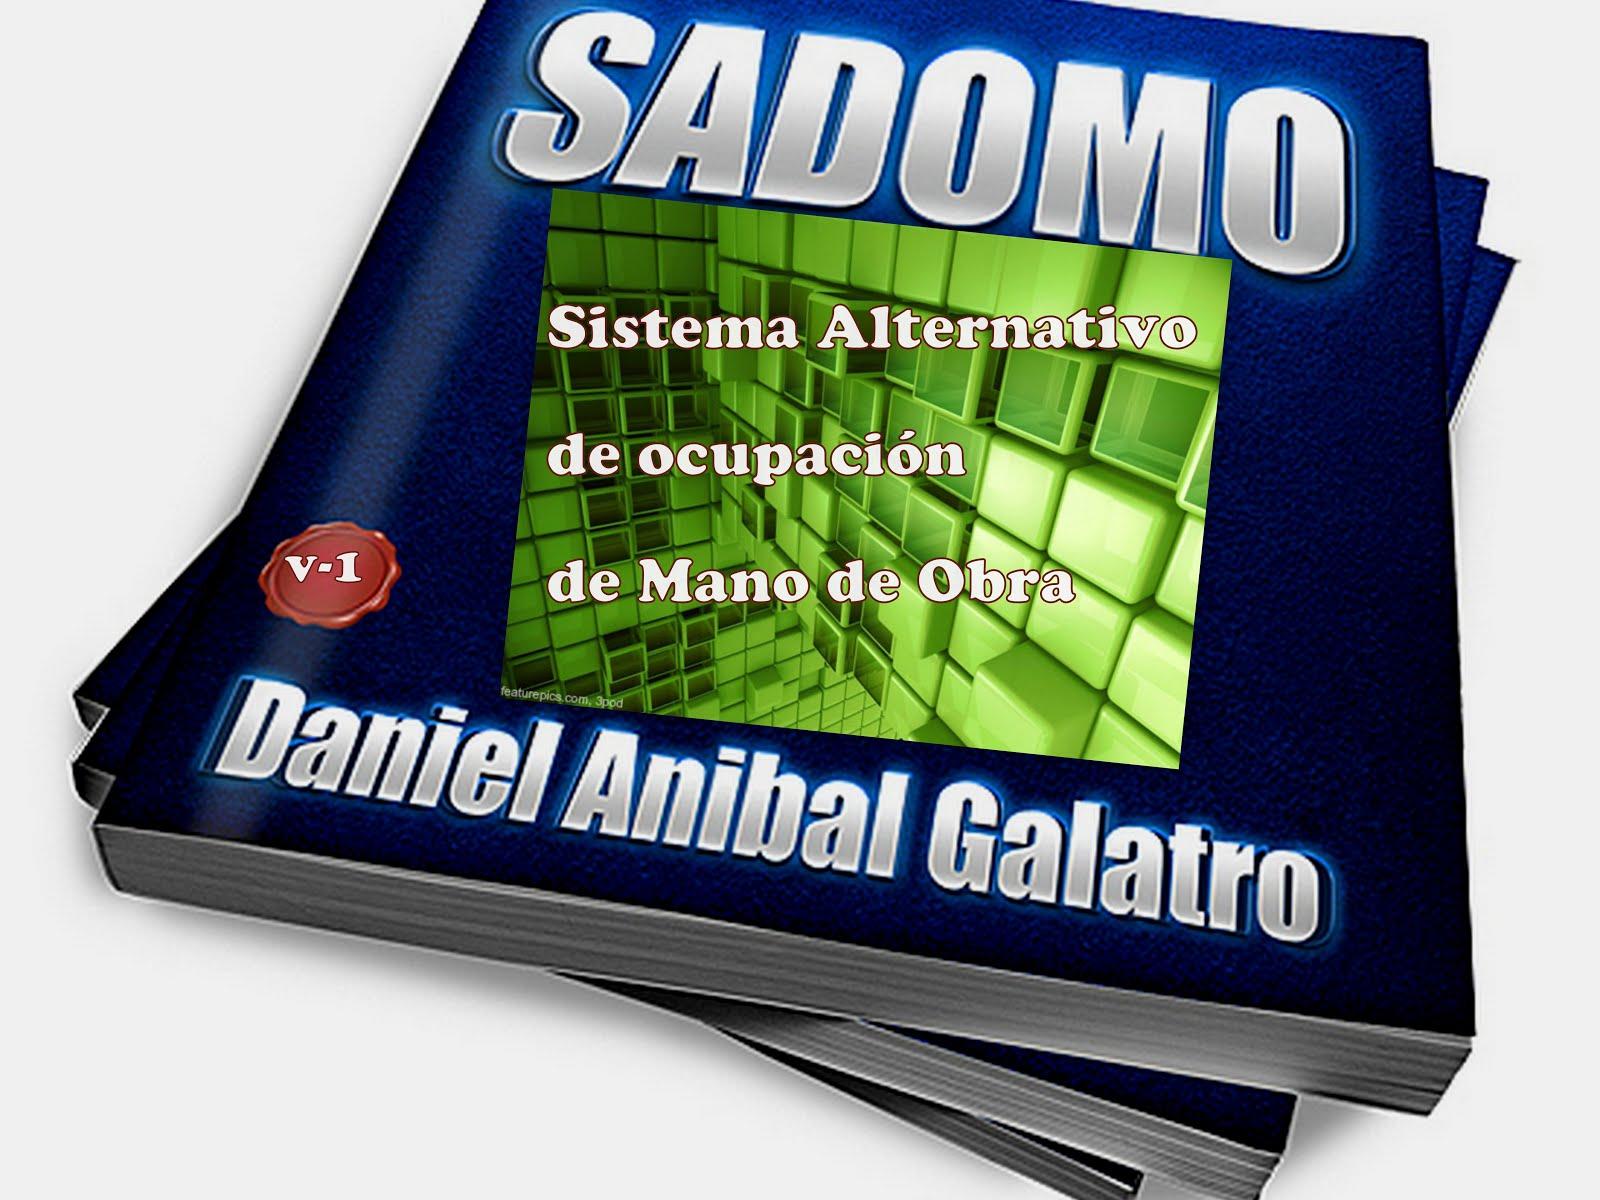 SADOMO